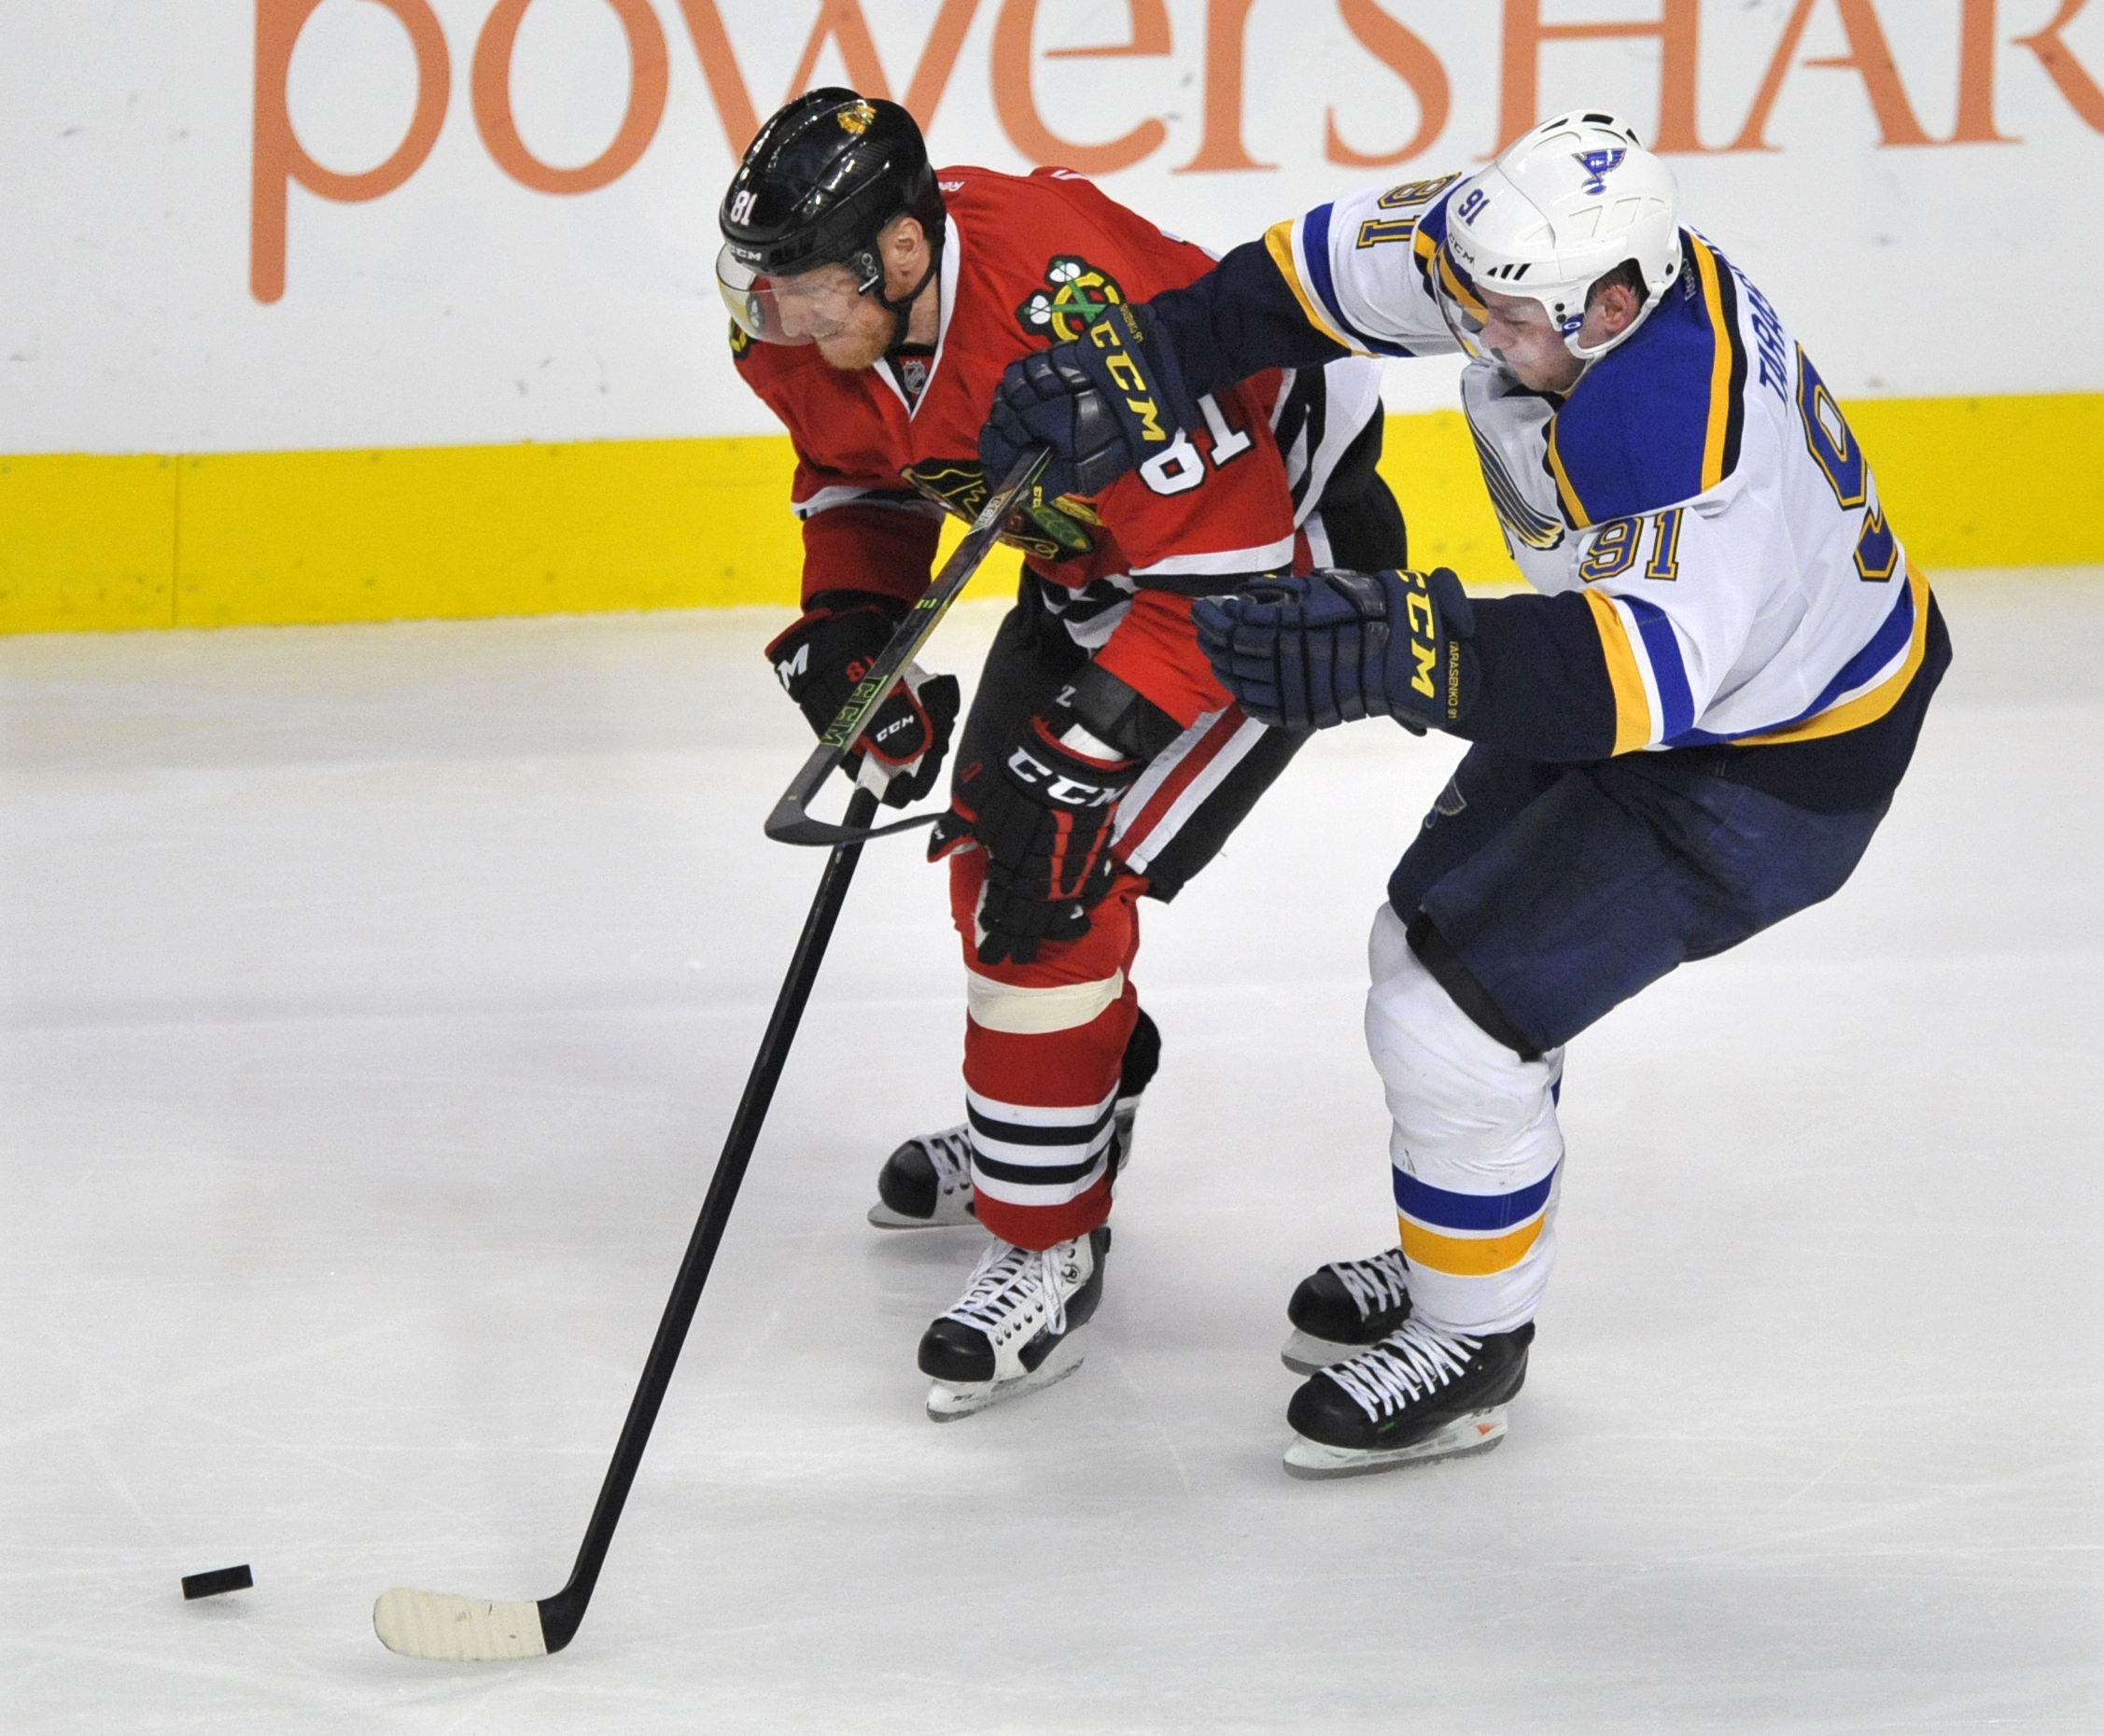 blues_blackhawks_hockey-43ac78a38cb04f99_r4163.jpeg